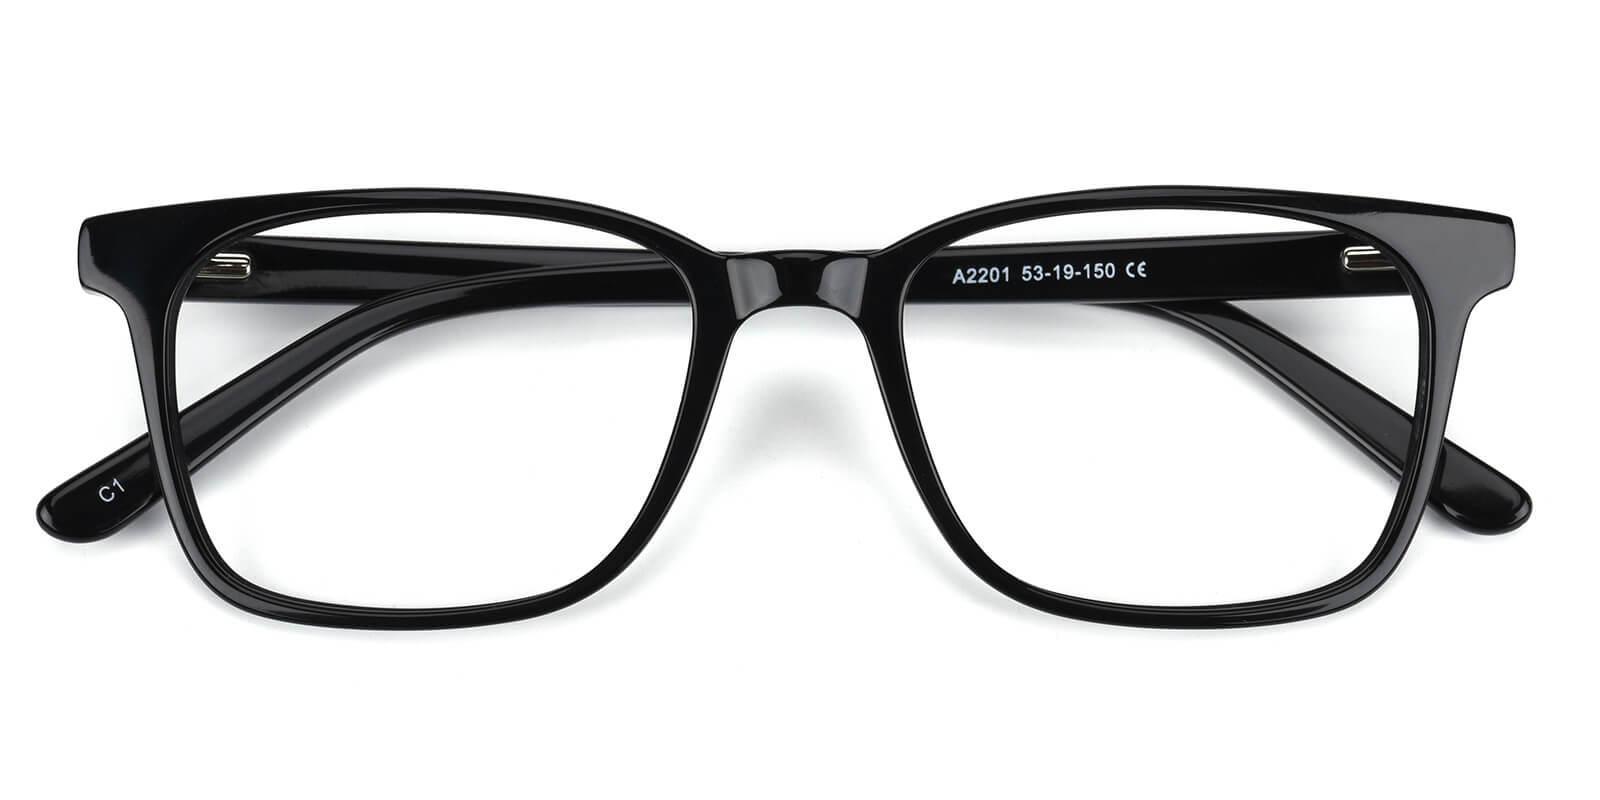 Kattan-Black-Square-Acetate-Eyeglasses-detail